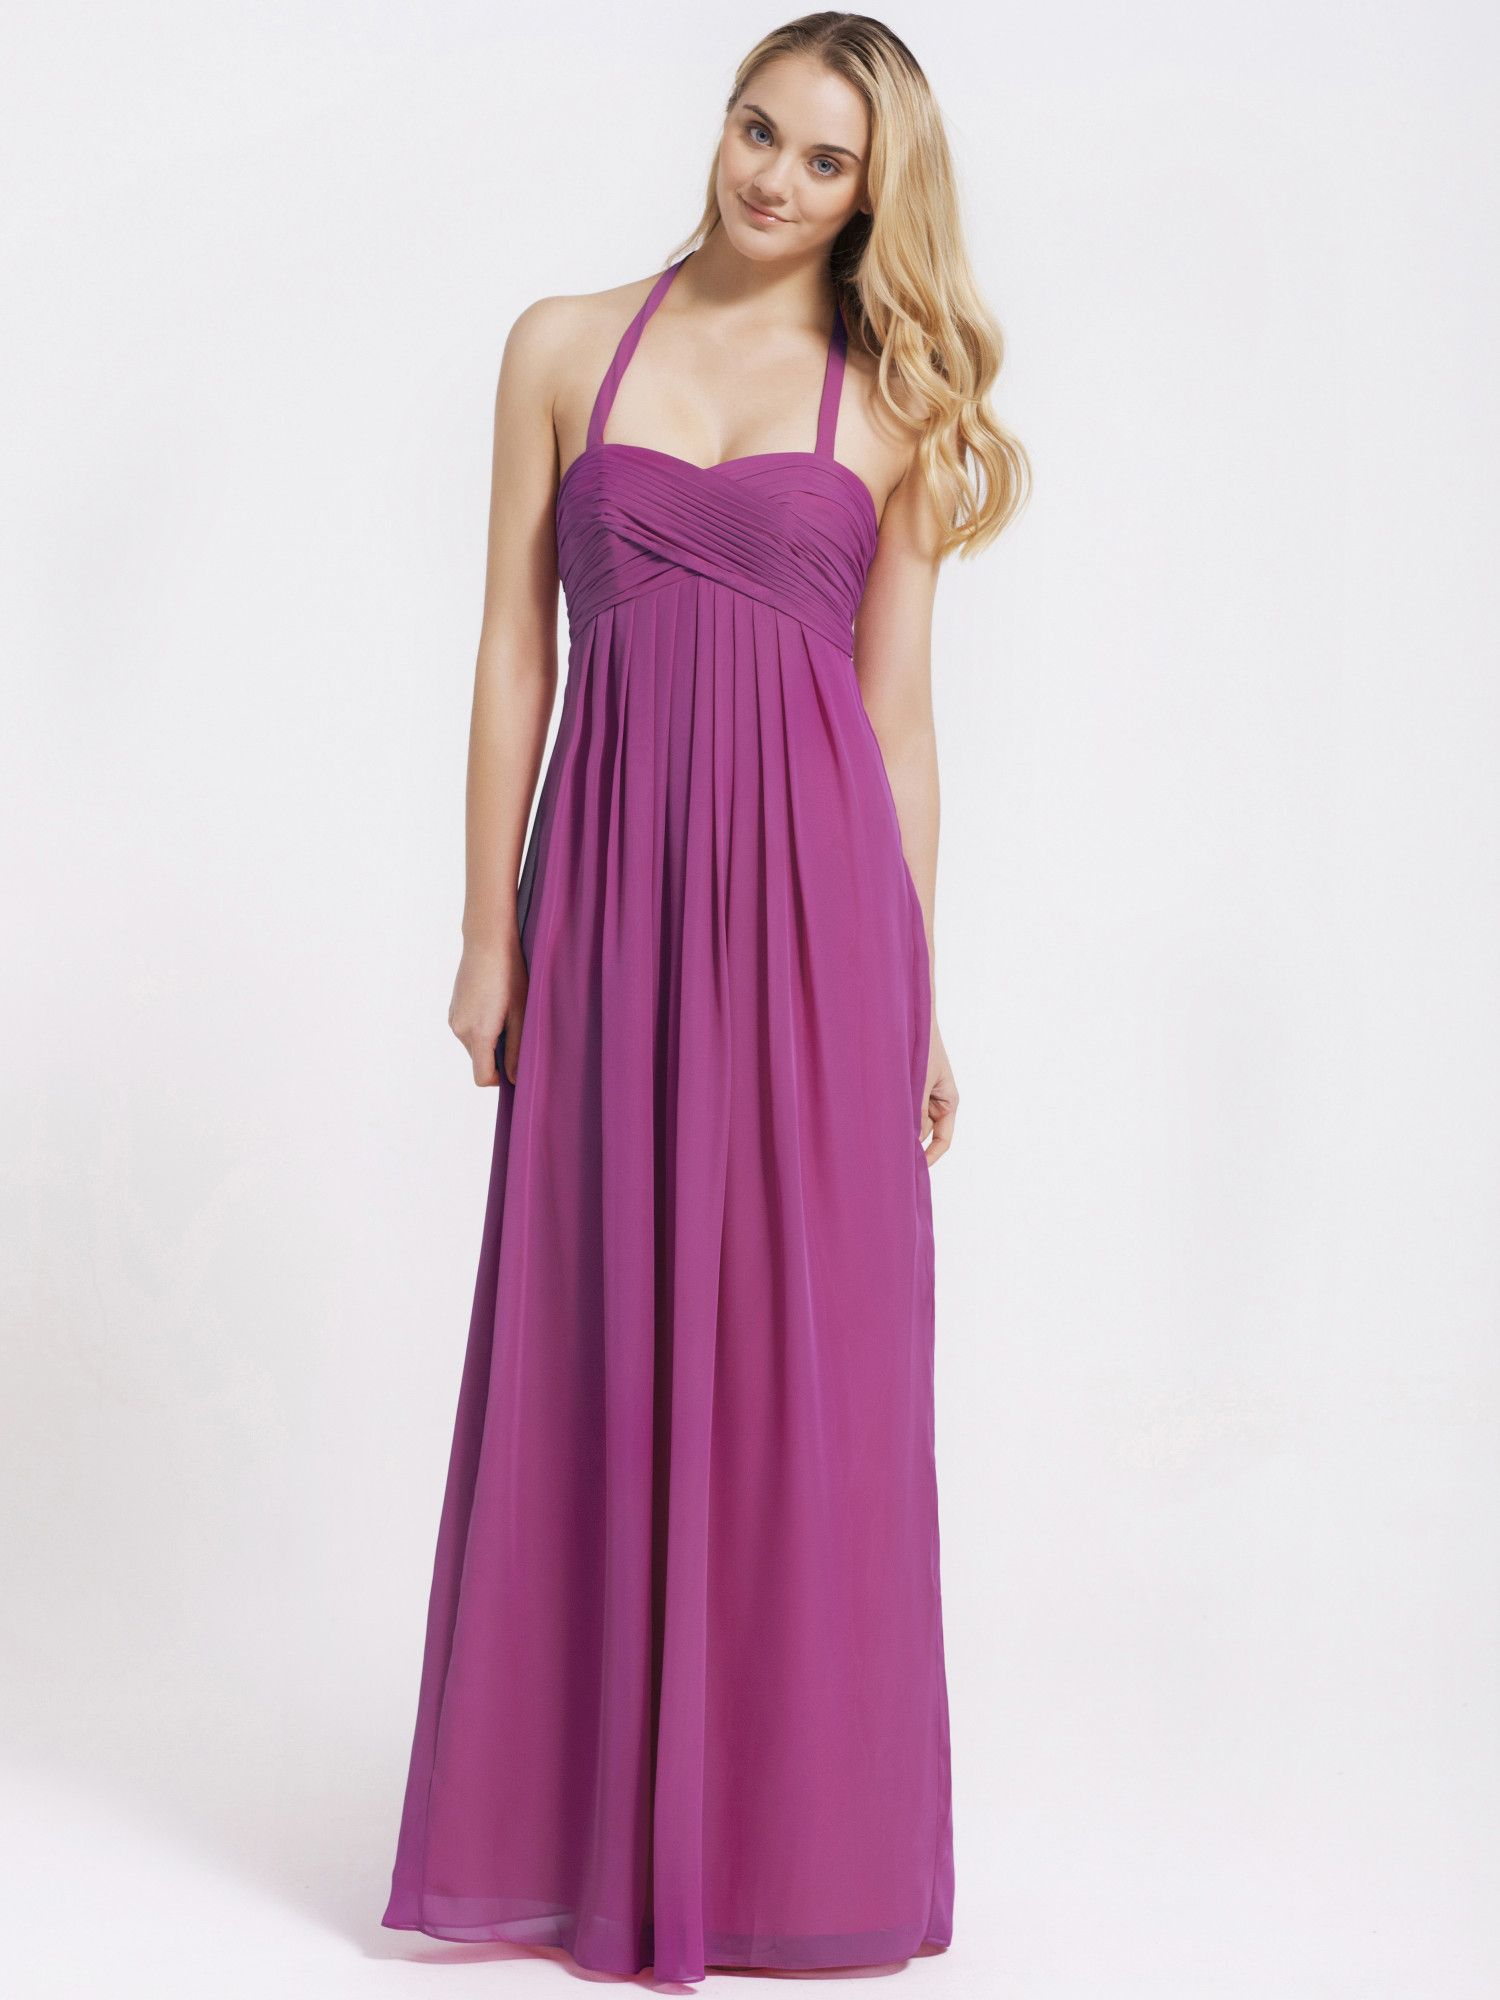 Model 0114986 | future mrs. sweeney | Pinterest | Chiffon bridesmaid ...